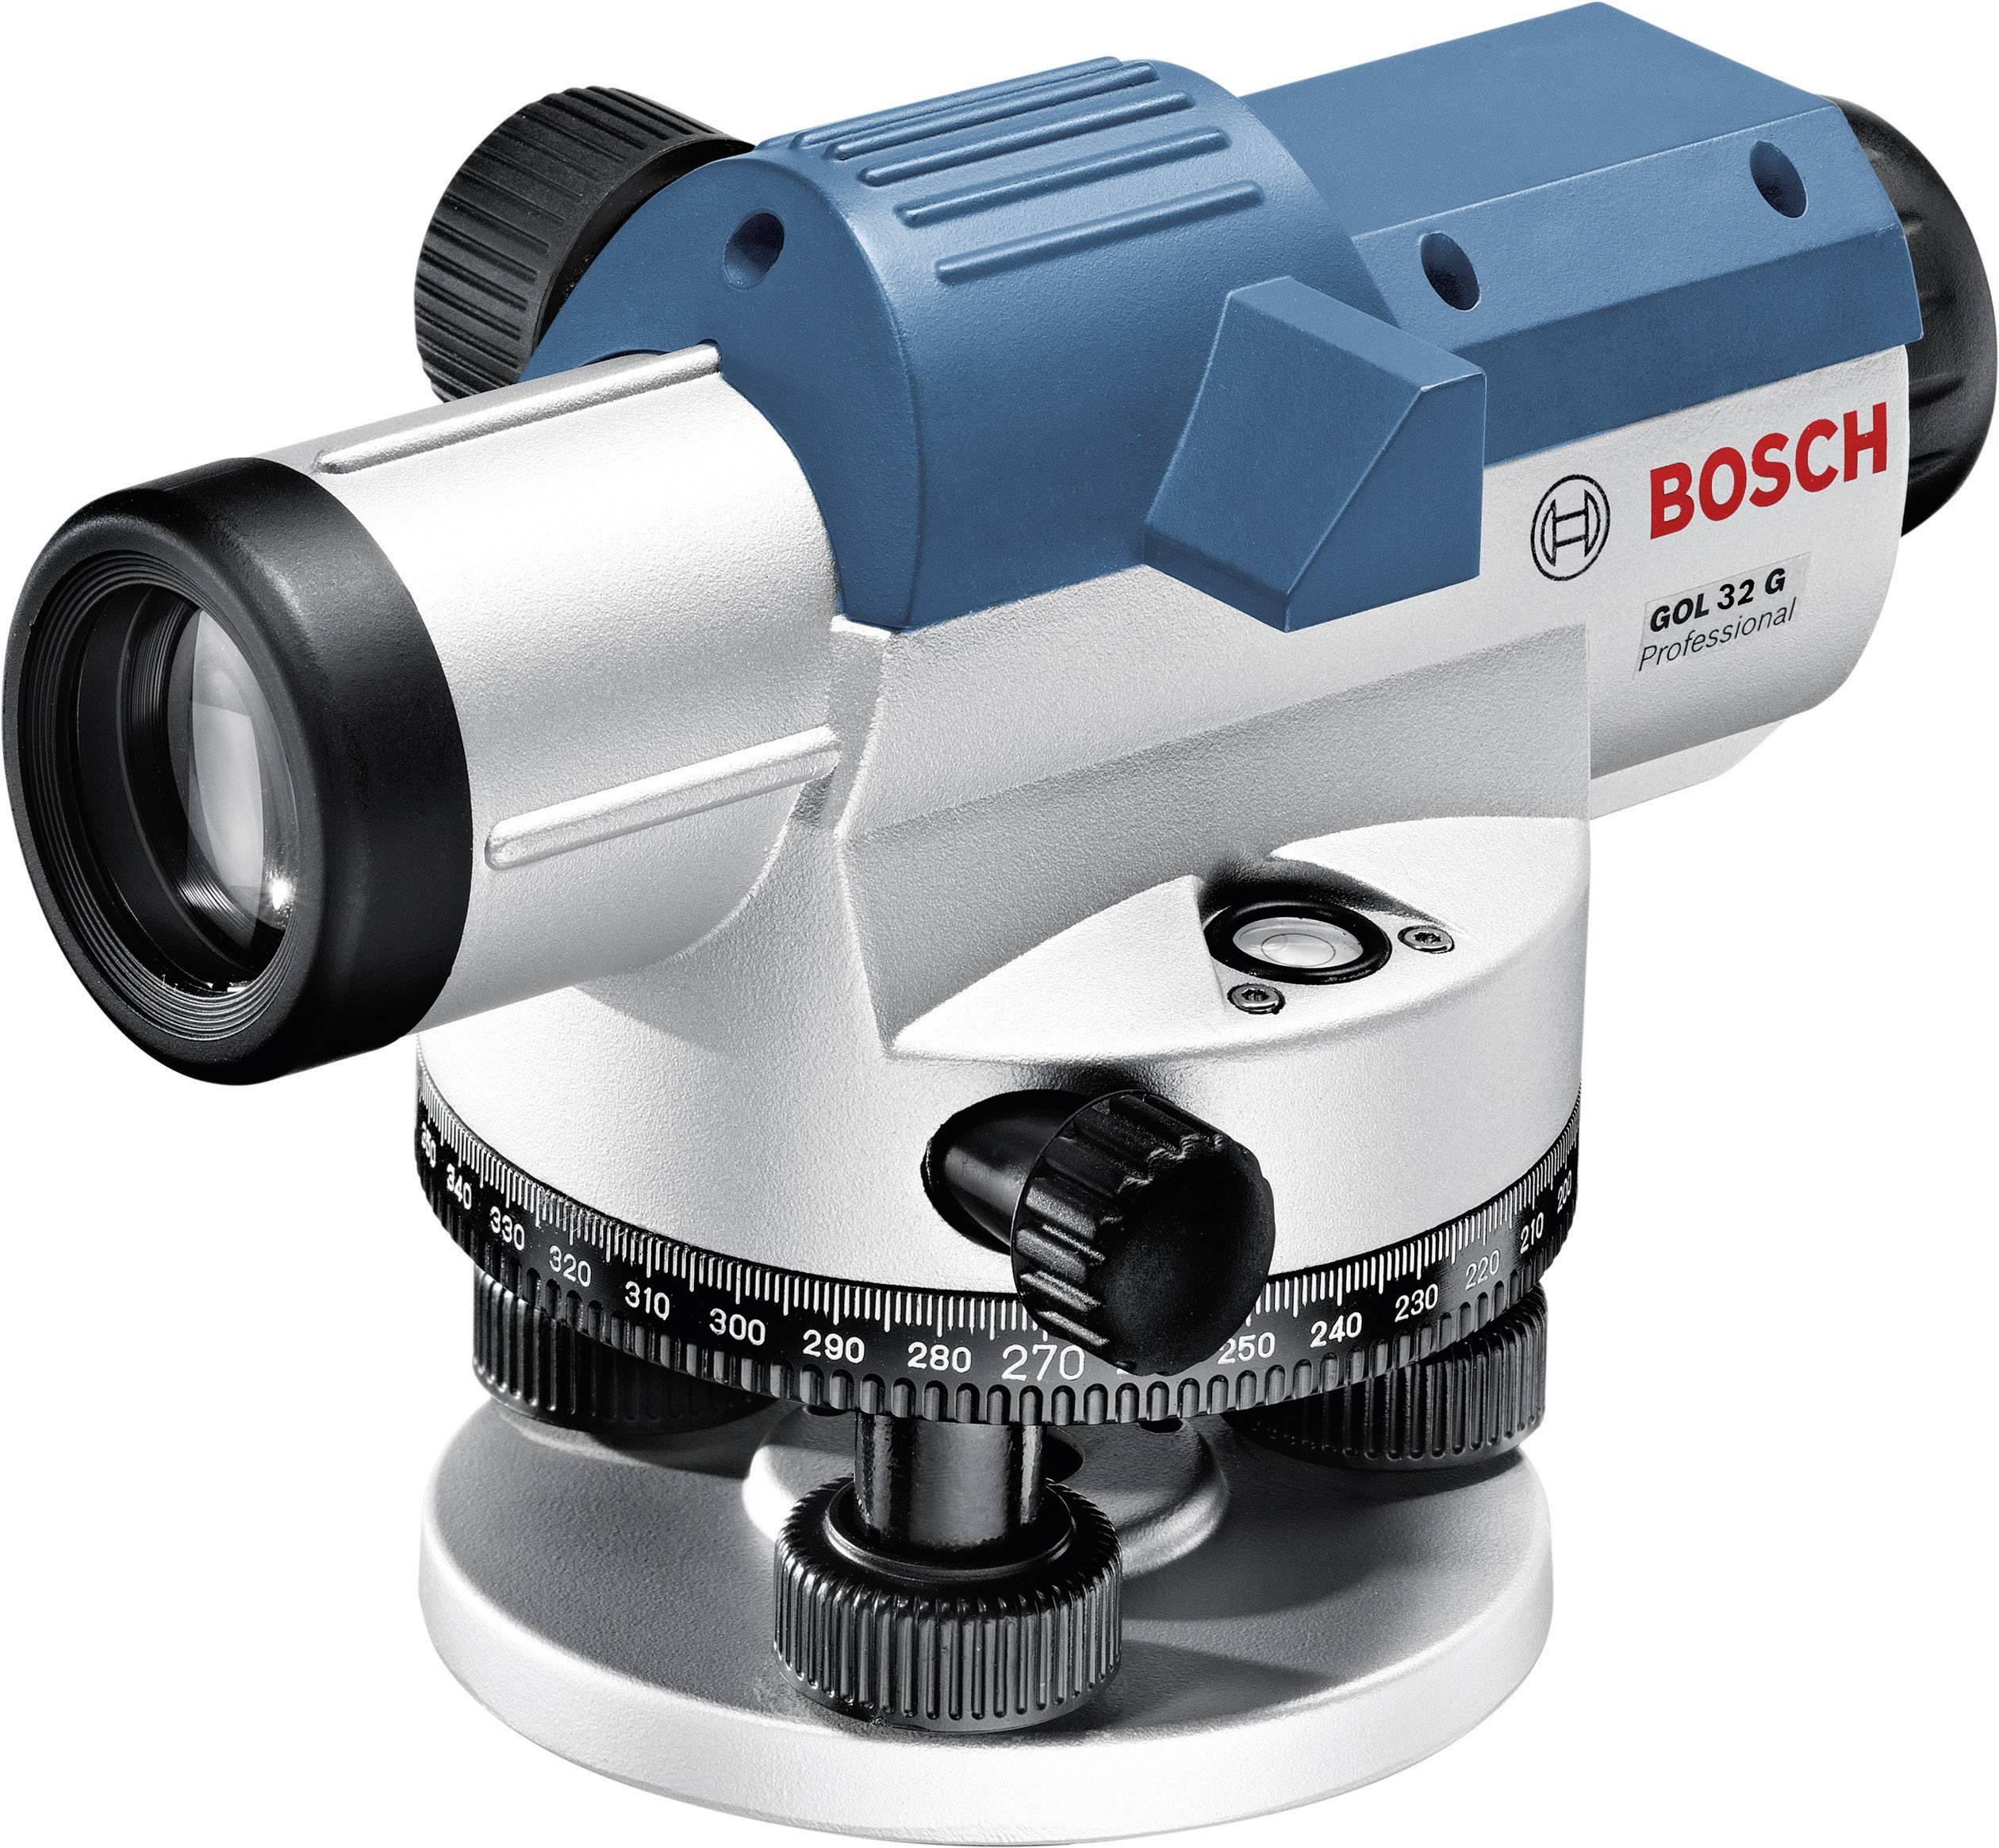 Bosch Professional GOL 32 G, dosah (max.): 120 m, ATT.INT.OPTICAL_MAGNIFICATION_MAX: 32 x